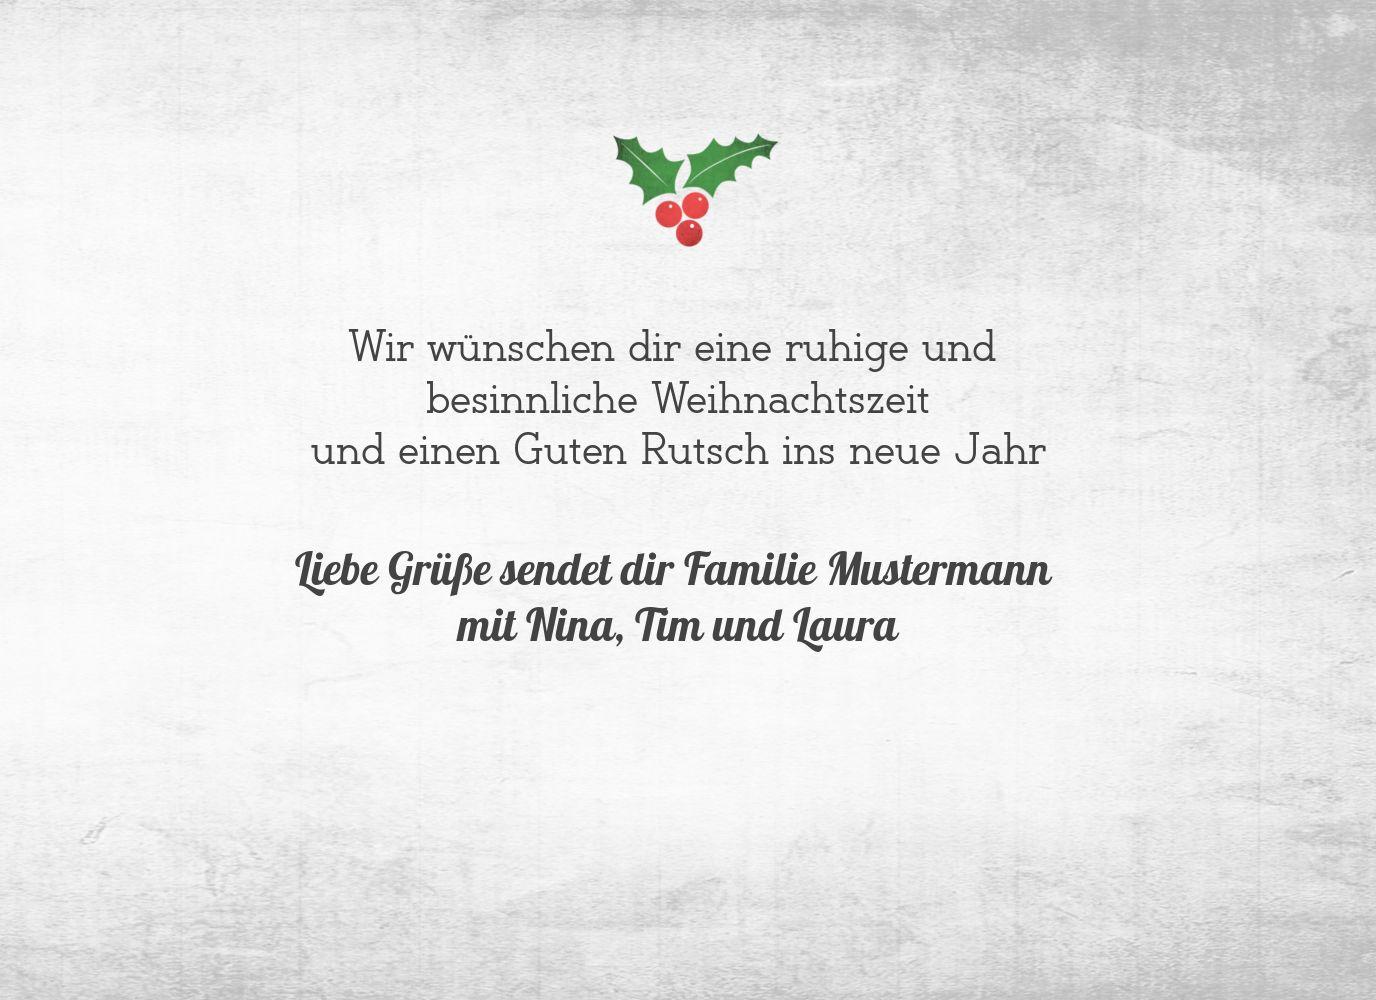 Ansicht 5 - Foto Grußkarte Merry Christmas